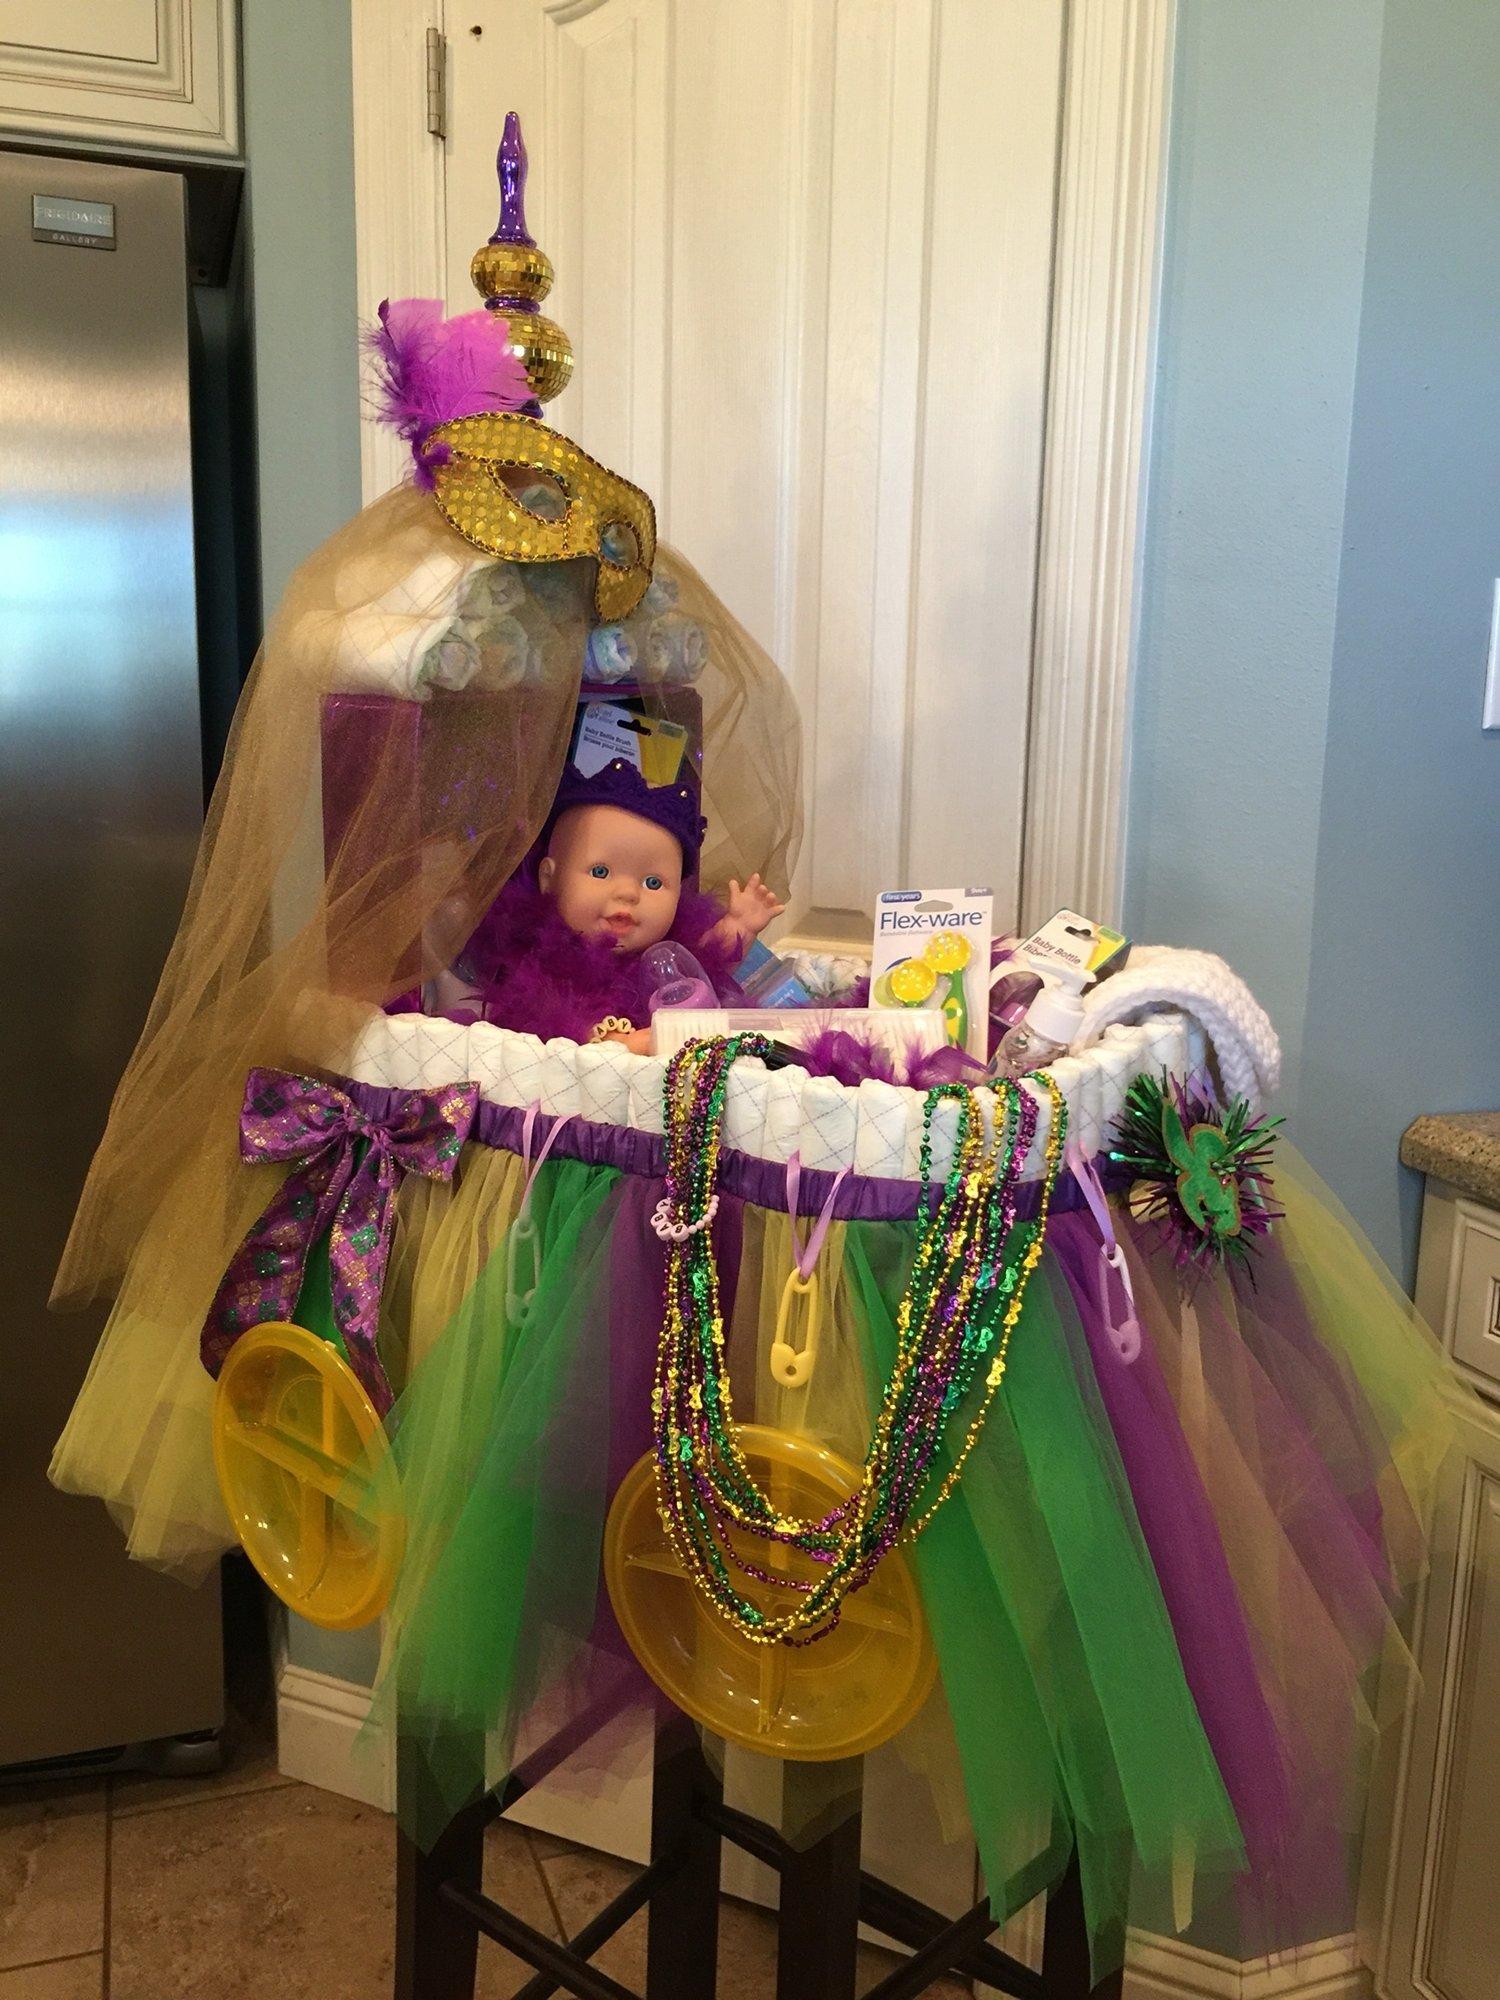 10 Attractive Homemade Mardi Gras Costume Ideas mardi gras diaper floatlaissez les bon temps rouler a mardi gras